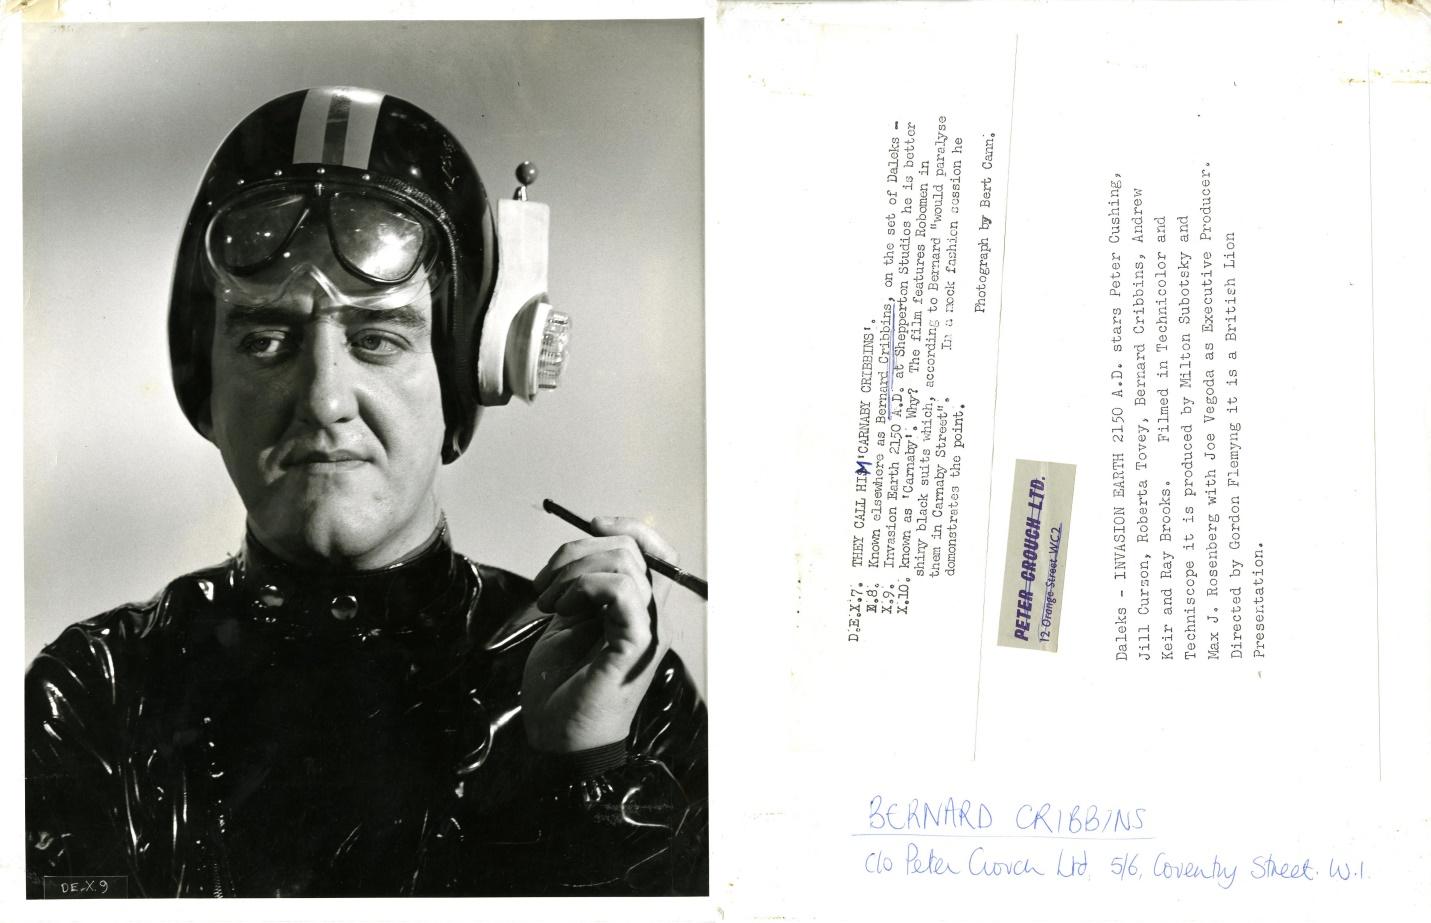 Bernard Cribbins promotional photo (front and back)